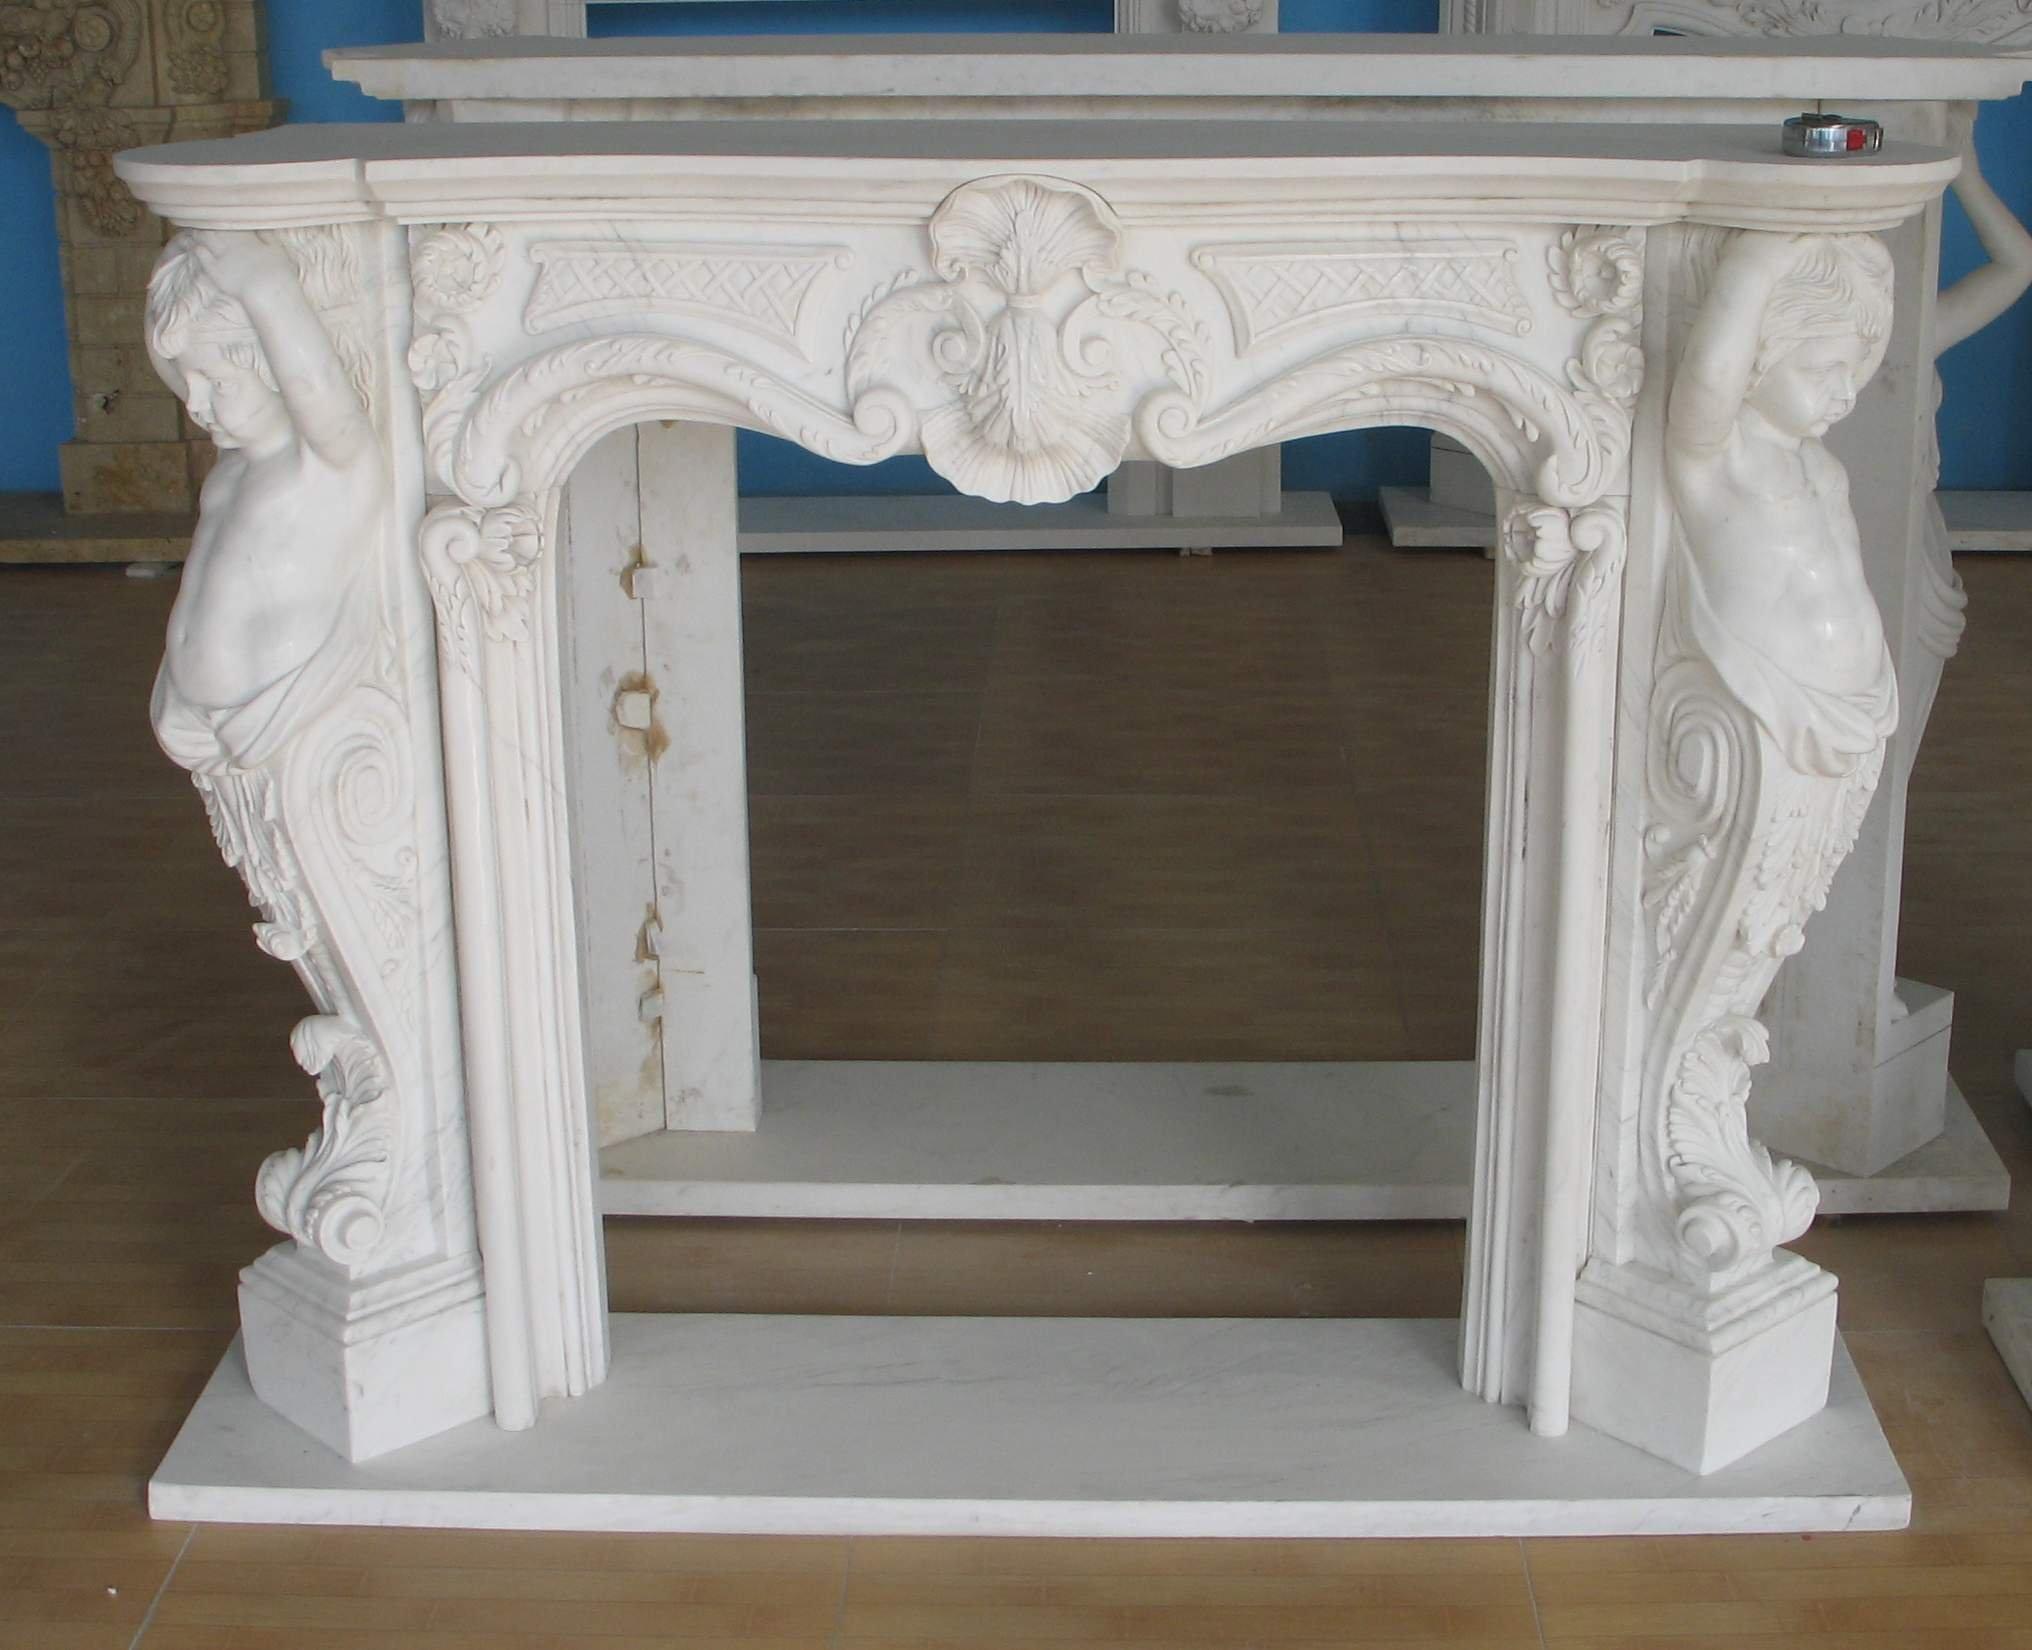 Muebles chimenea muebles de tv con chimenea muebles de for Muebles antiguos las palmas